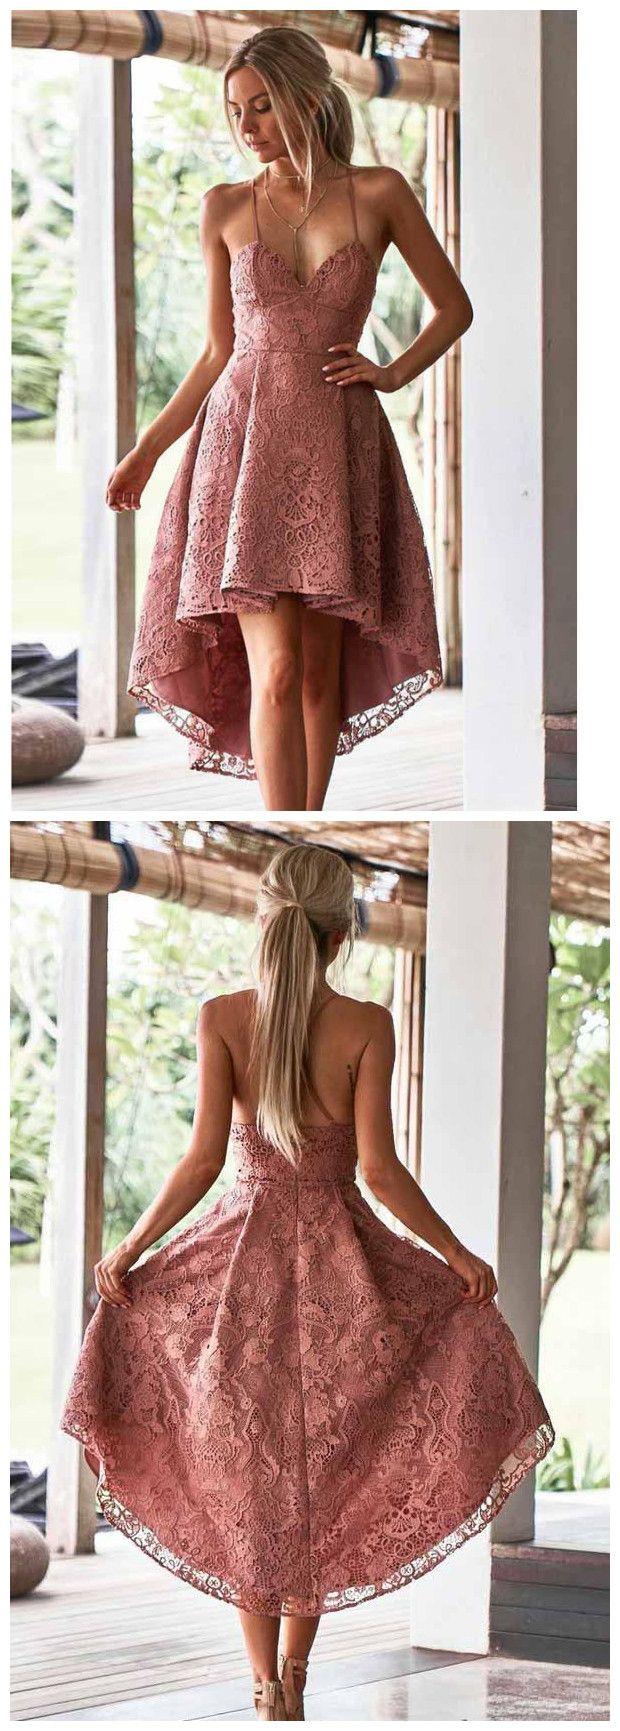 A-Line Spaghetti Straps High Low Blush Lace Short Prom Dress Homecoming Dress AMY1573 1